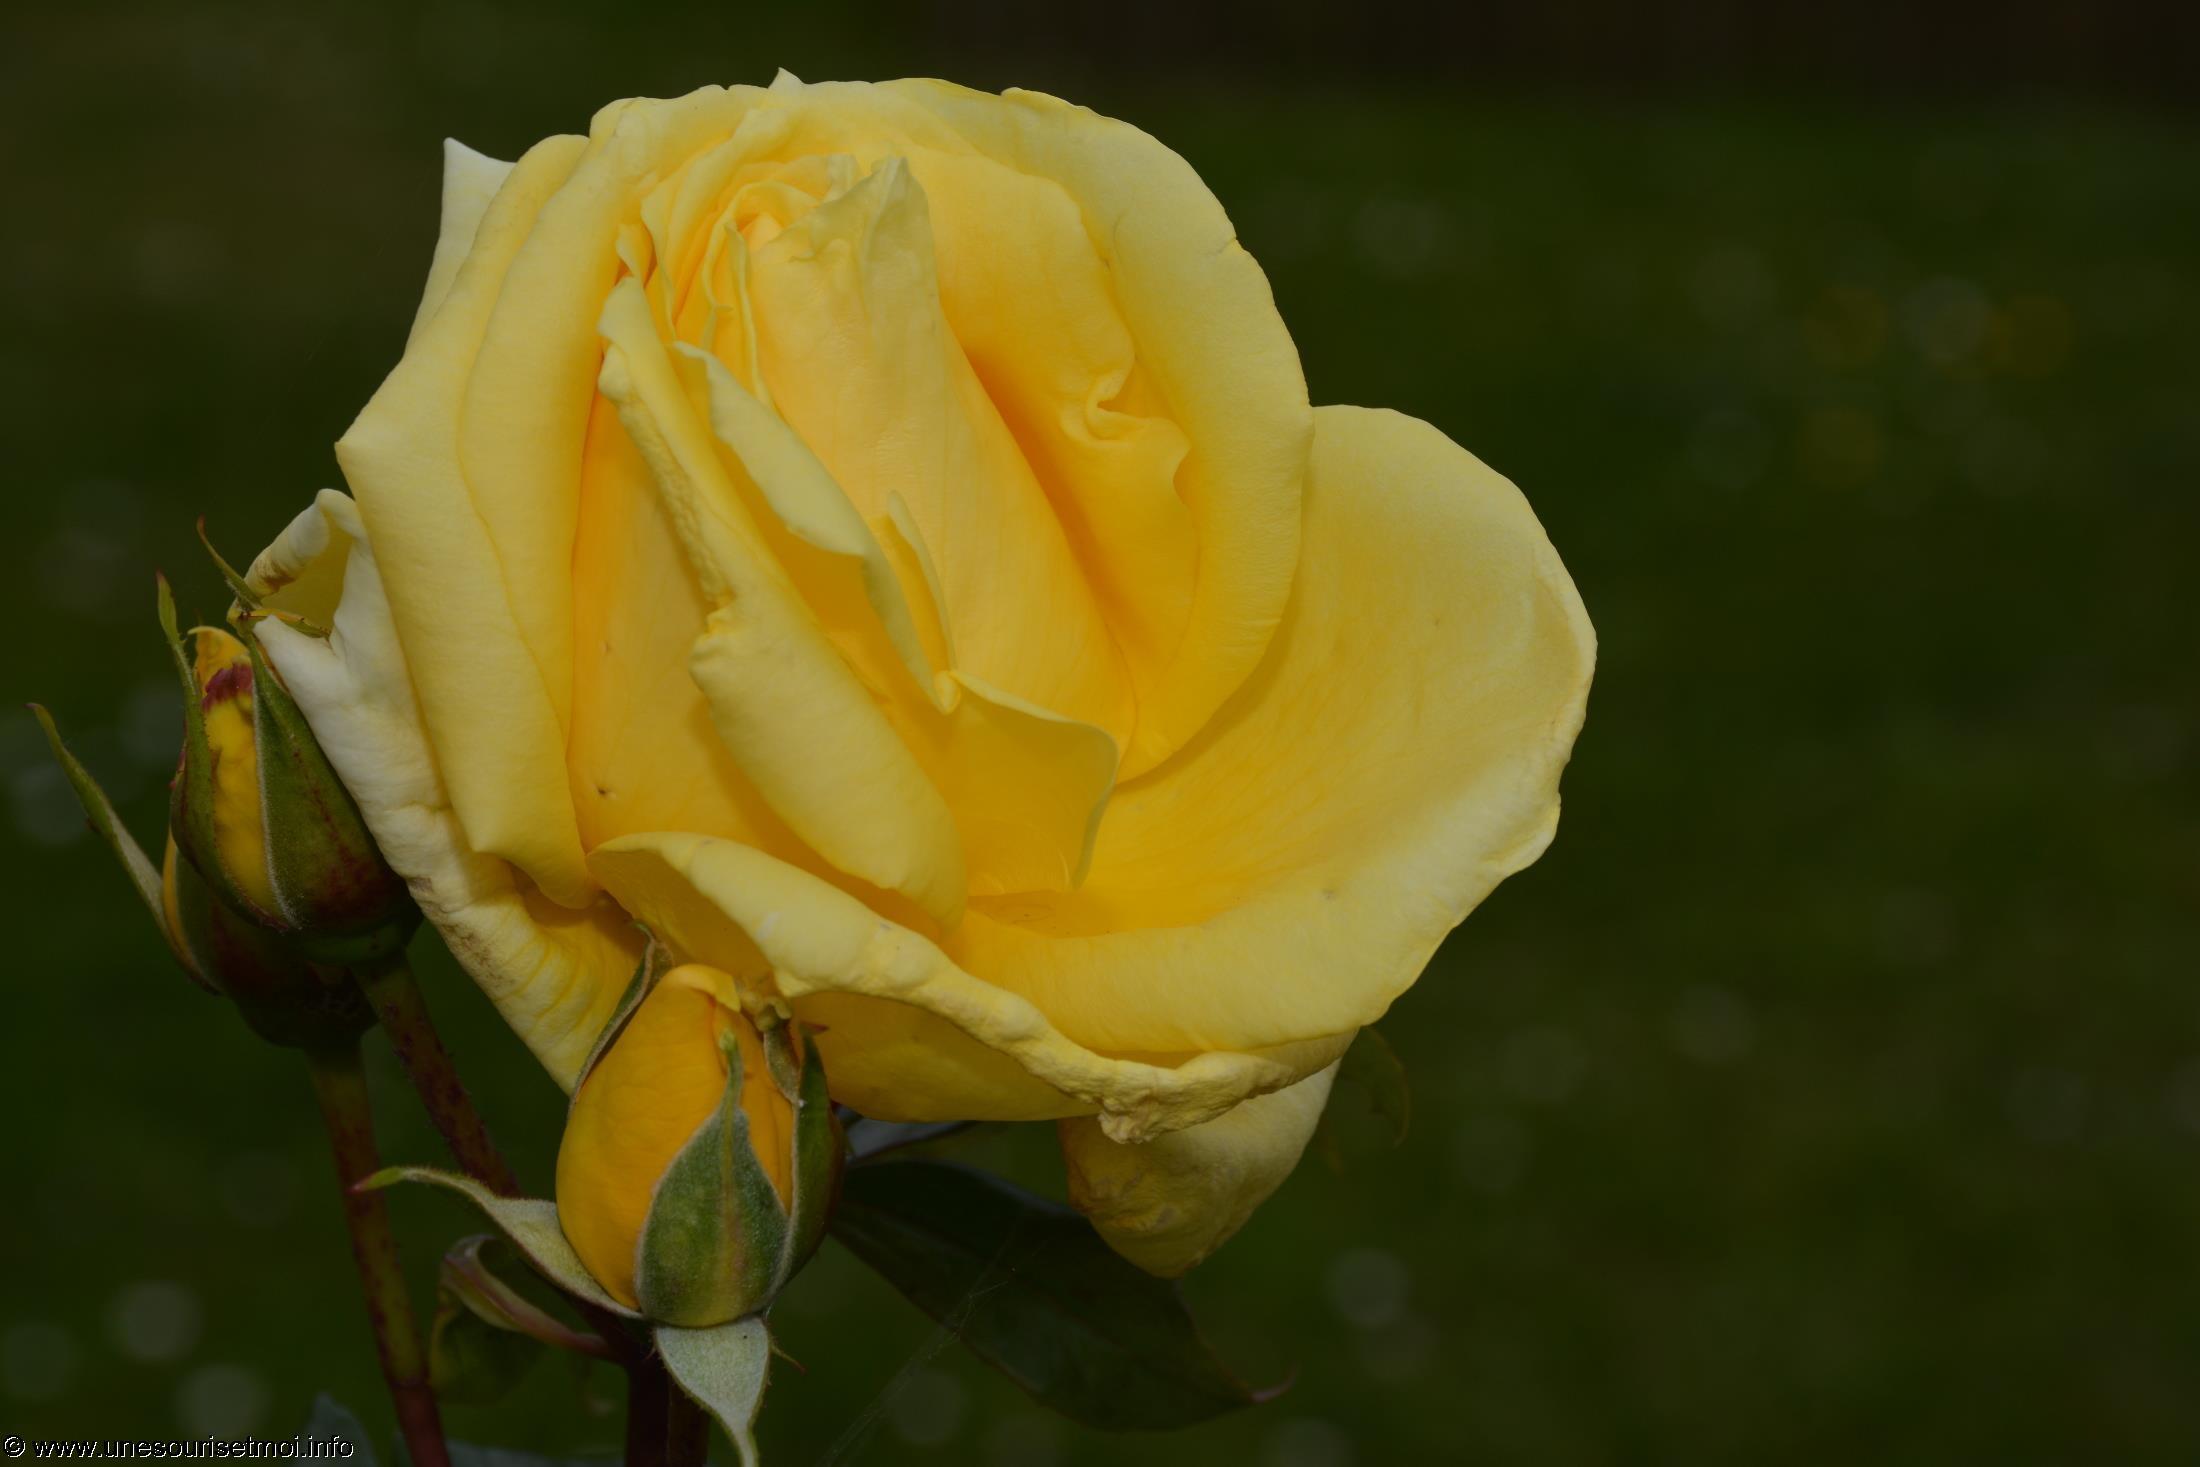 fleurs-ete-printemps-du-jardin-en-grand-format-HD_1